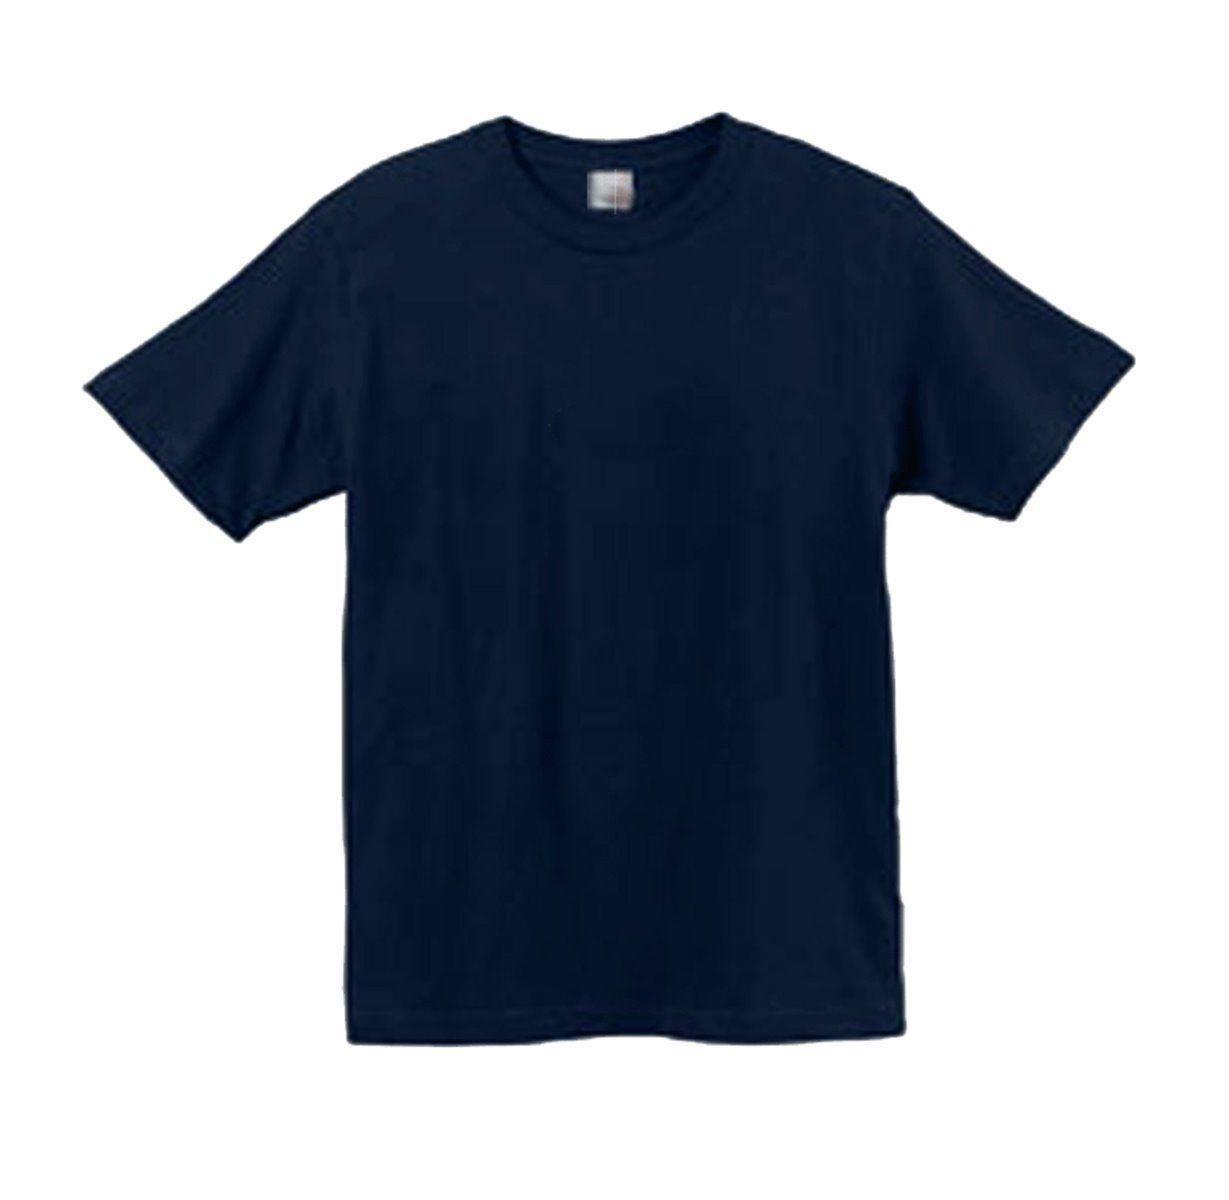 big mens king size t shirt t shirt tee navy cotton 2xl 3xl 4xl 5xl 6xl 7xl 8xl ebay. Black Bedroom Furniture Sets. Home Design Ideas